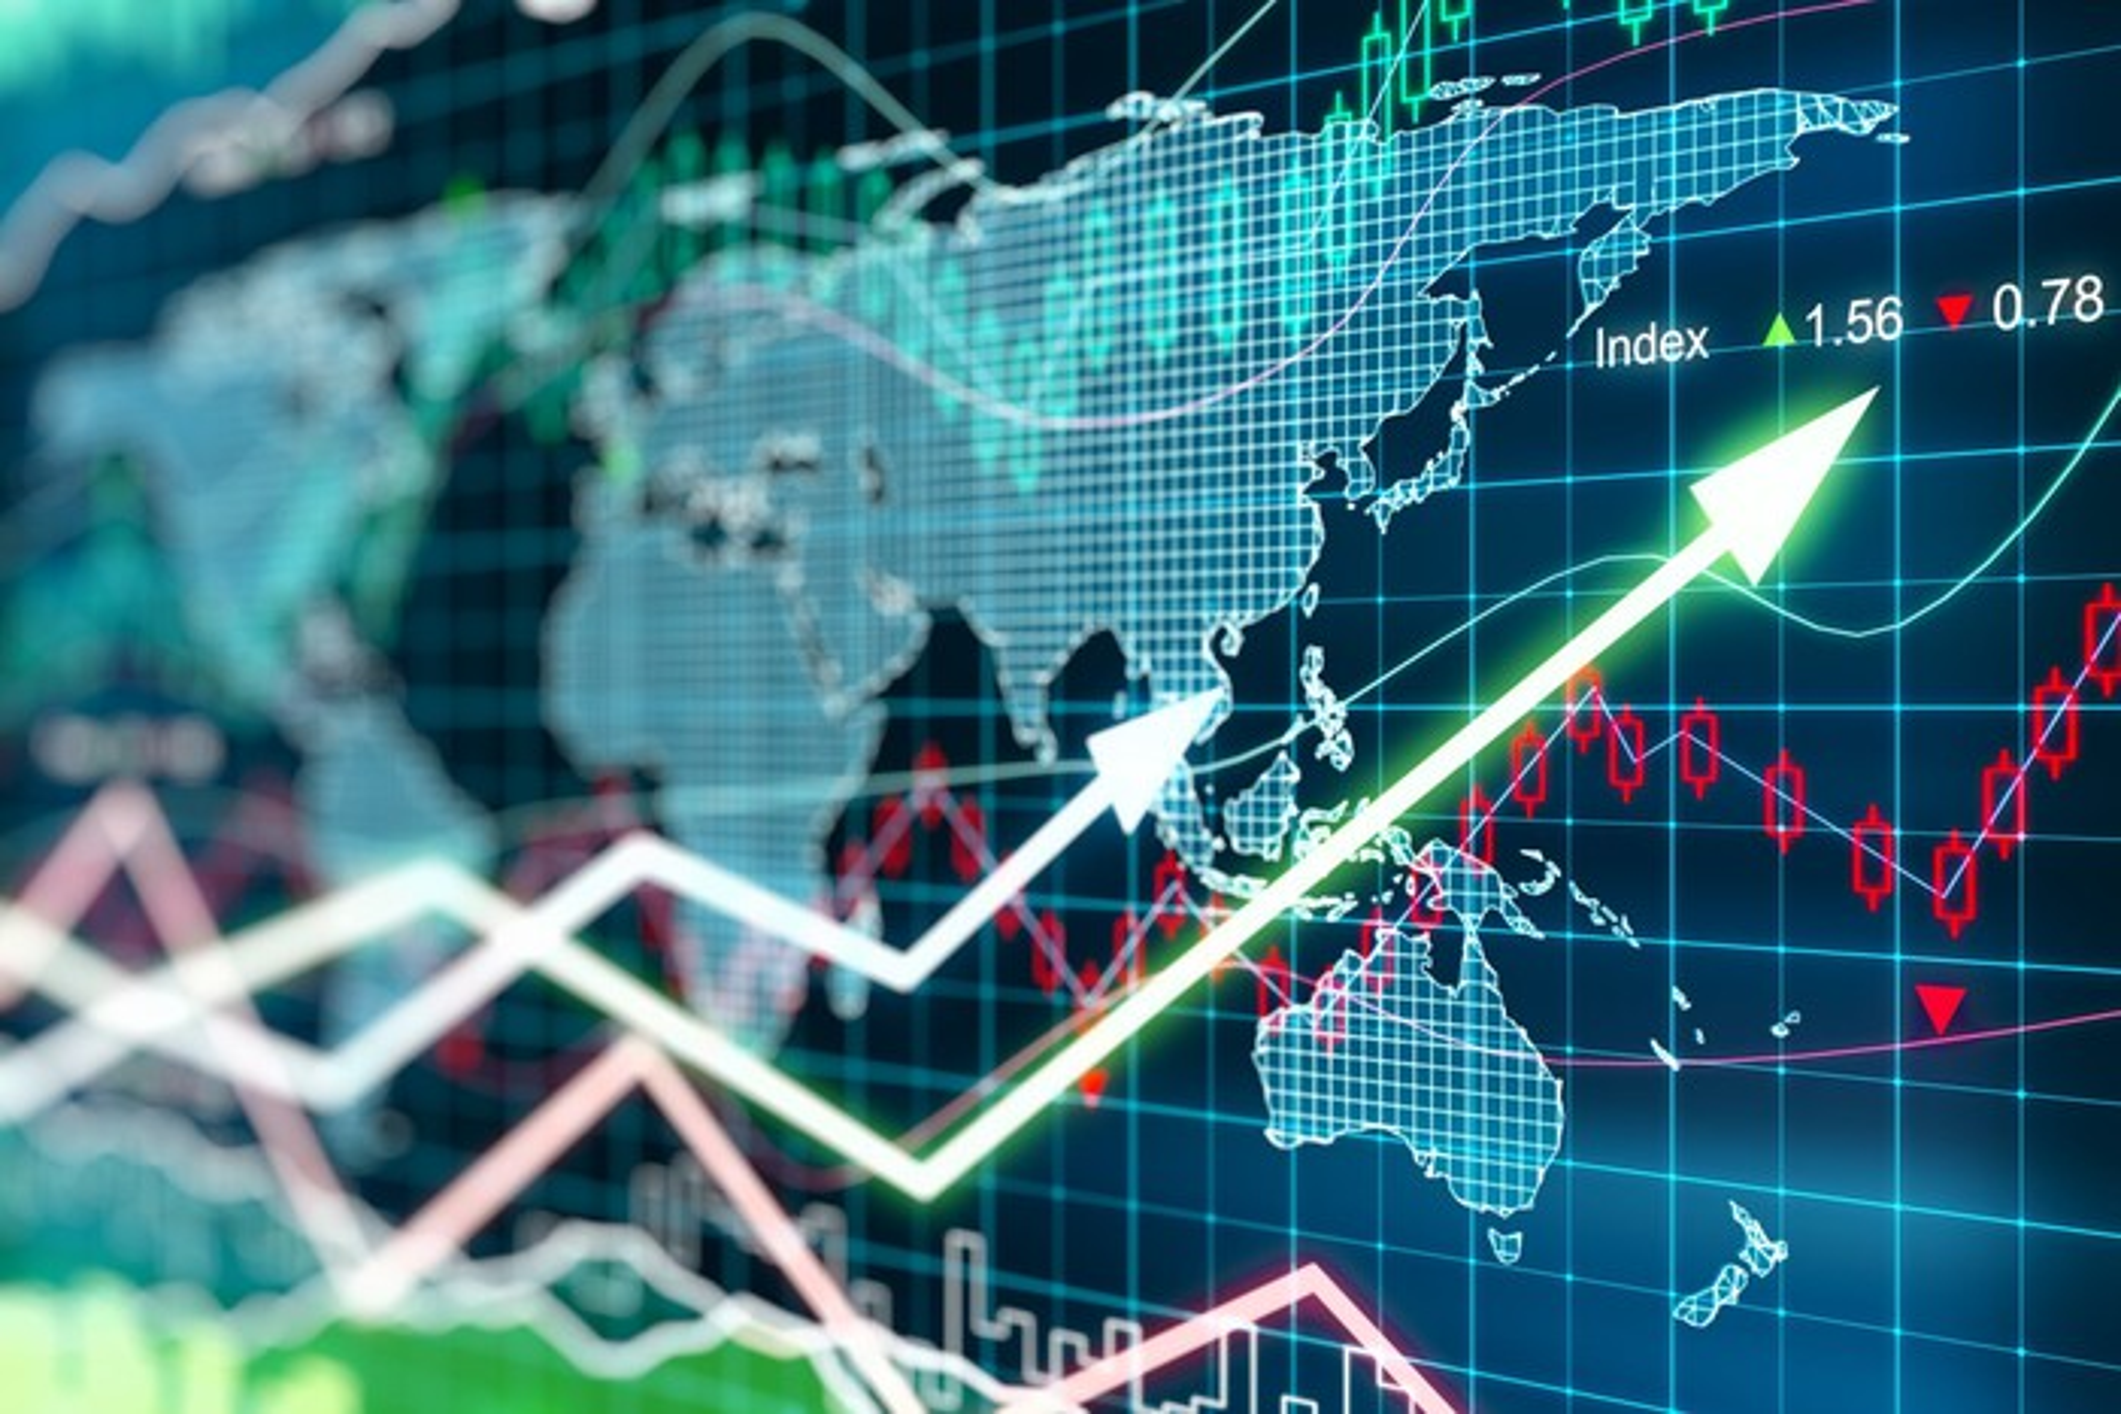 Rising stock market chart